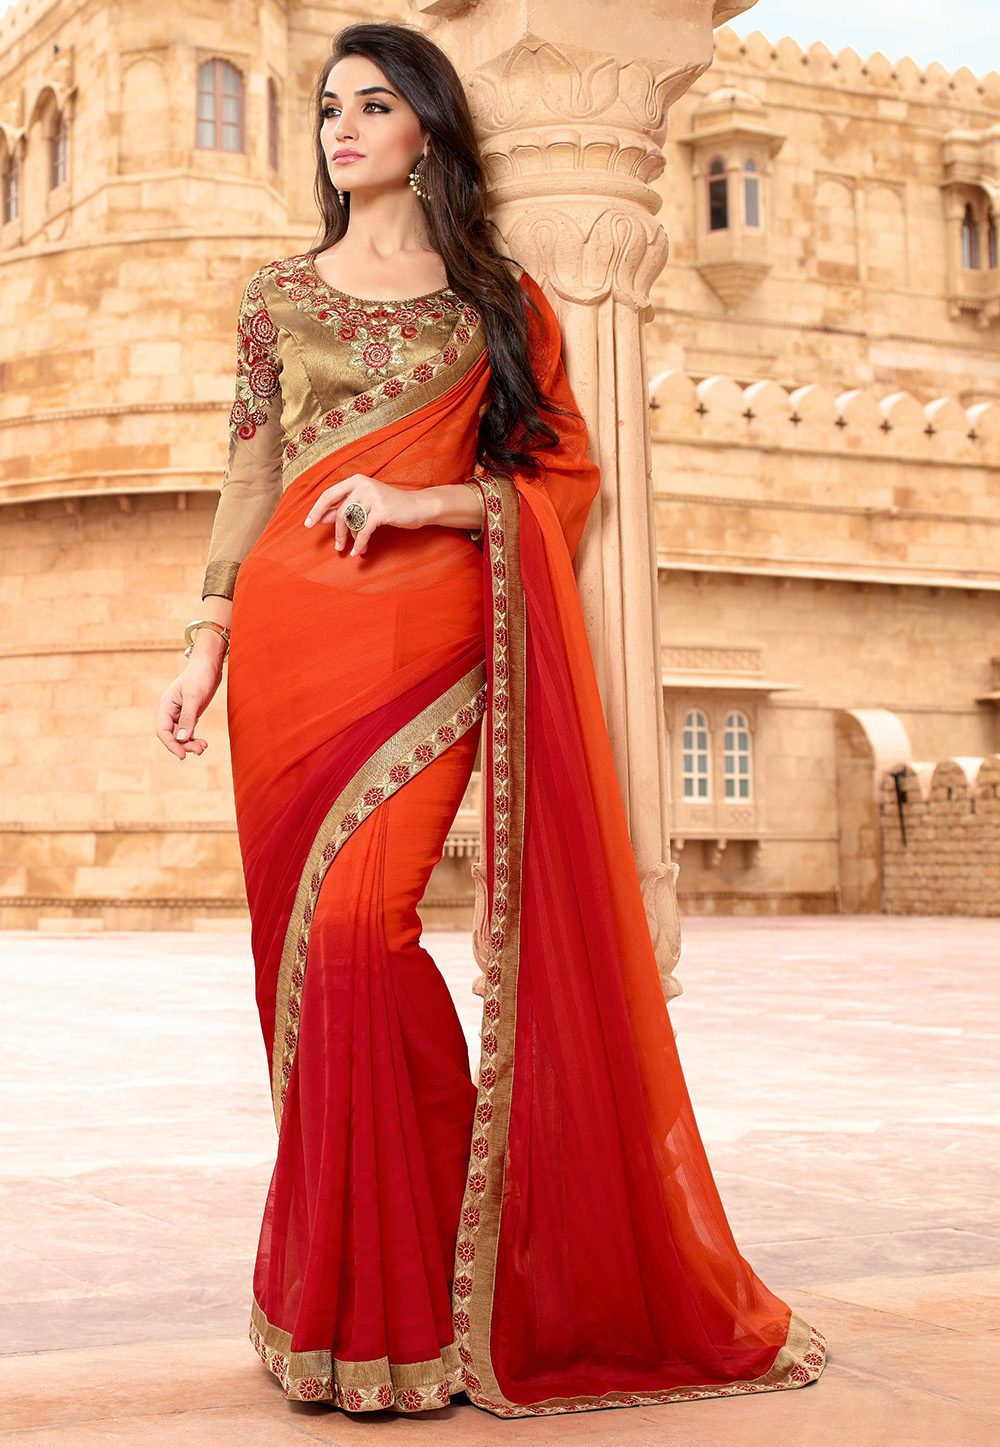 A shaded orange and red faux chiffon jacquard saree. (Image: Utsavfashion.com)